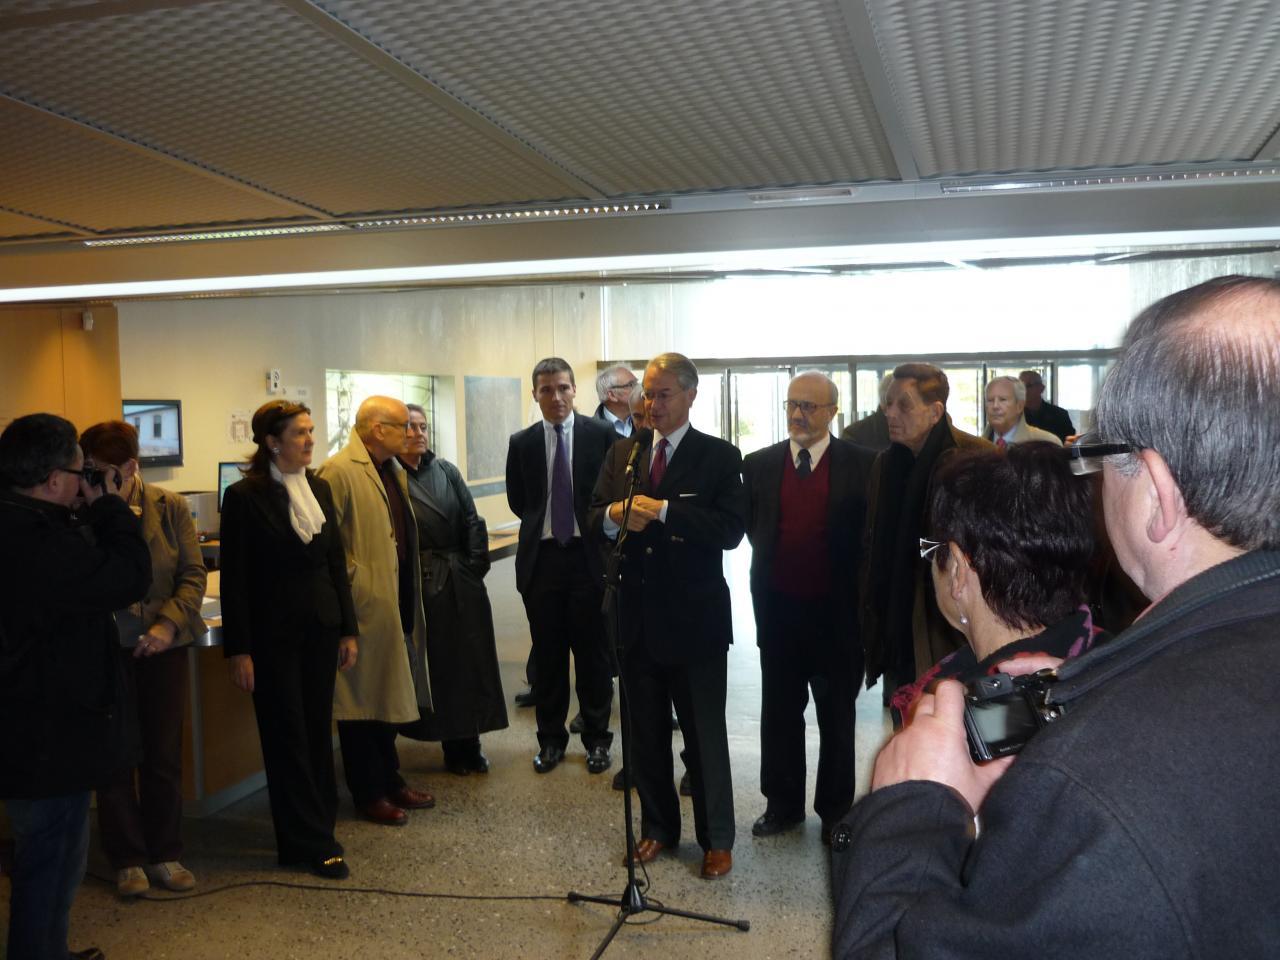 Inauguration en présence de Philippe Marini et Volker Schlöndorff